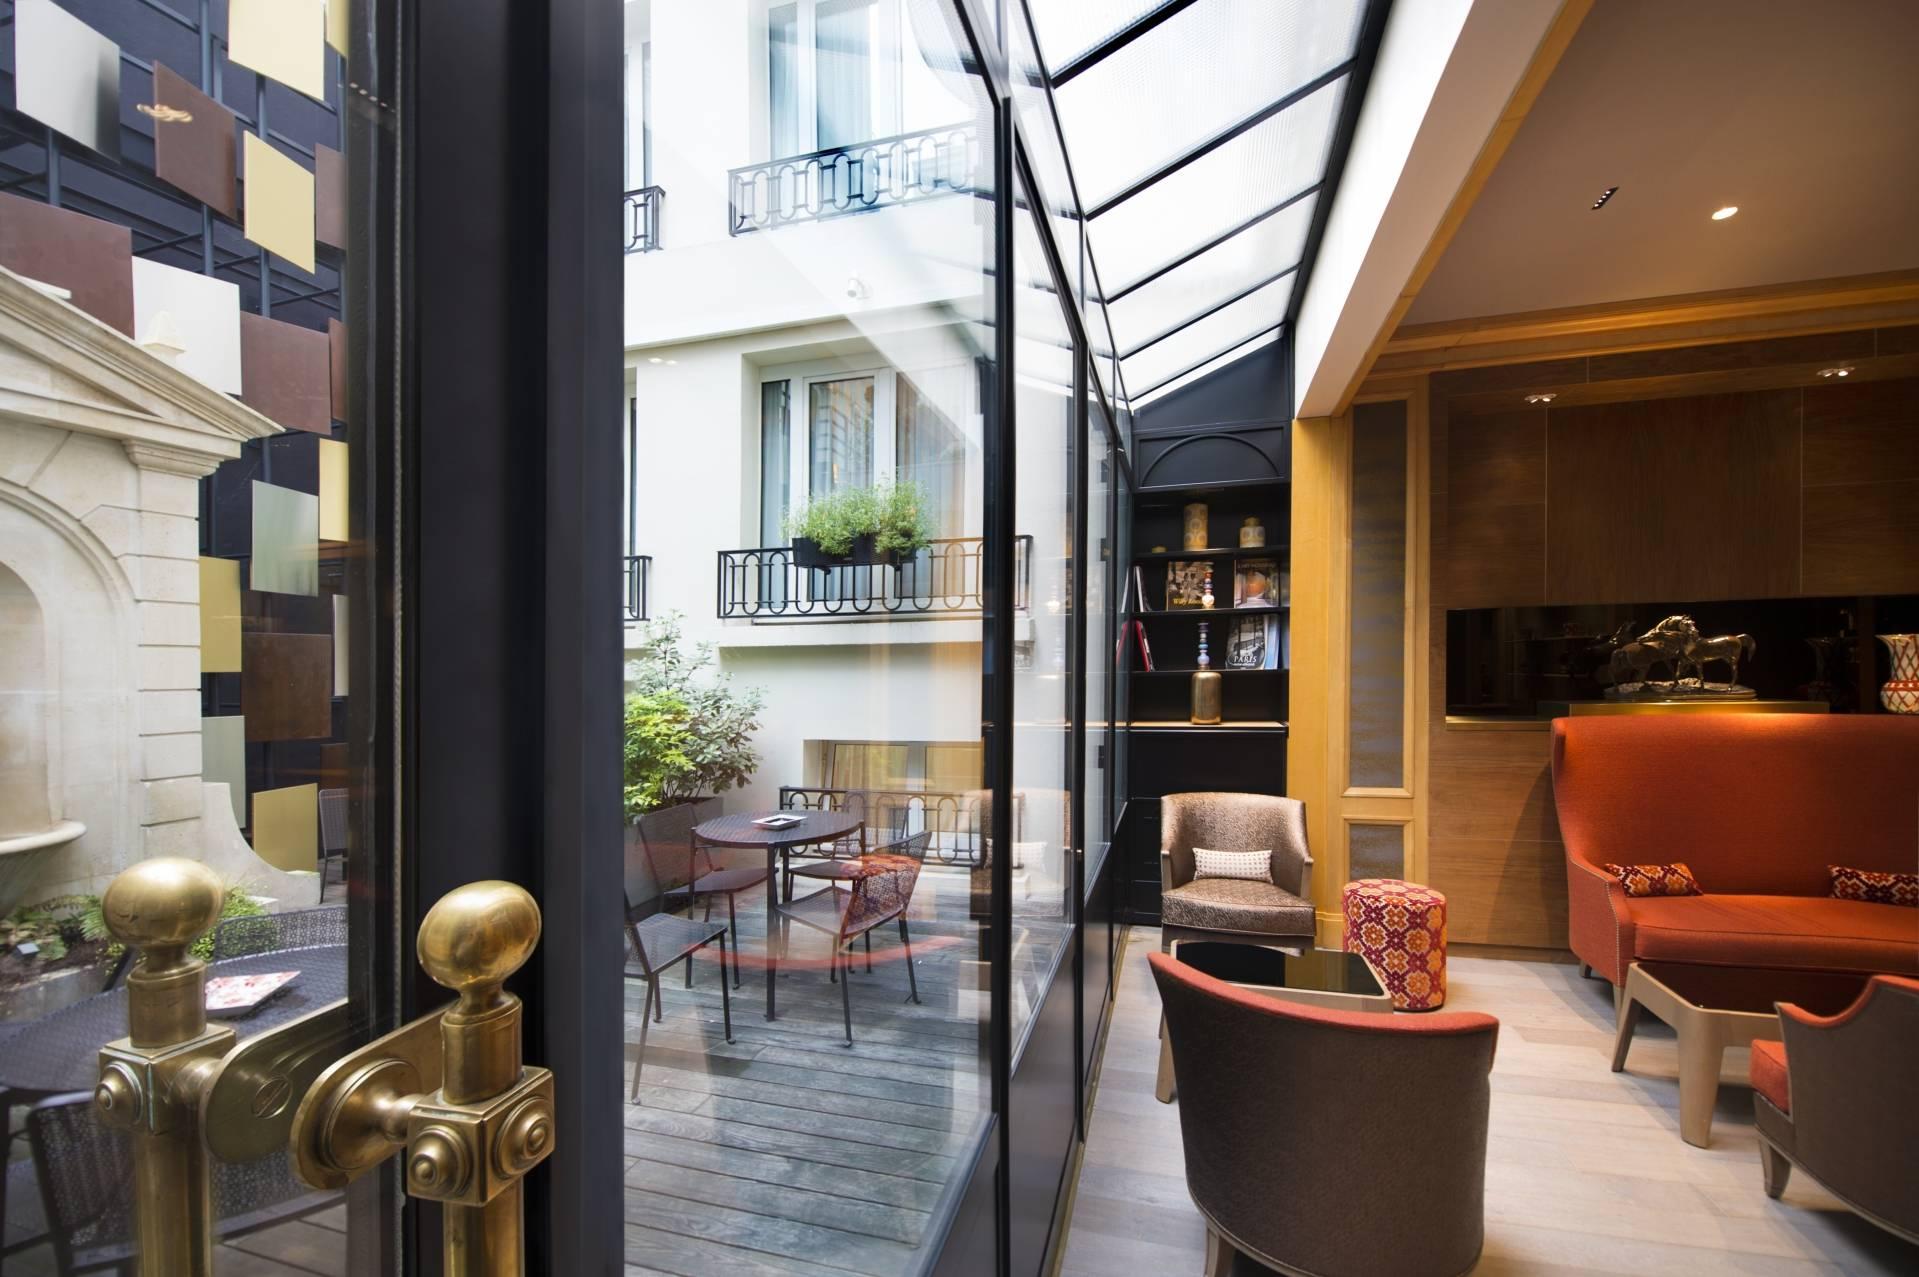 vitrages chauffants pour un confort in dit et in galable. Black Bedroom Furniture Sets. Home Design Ideas